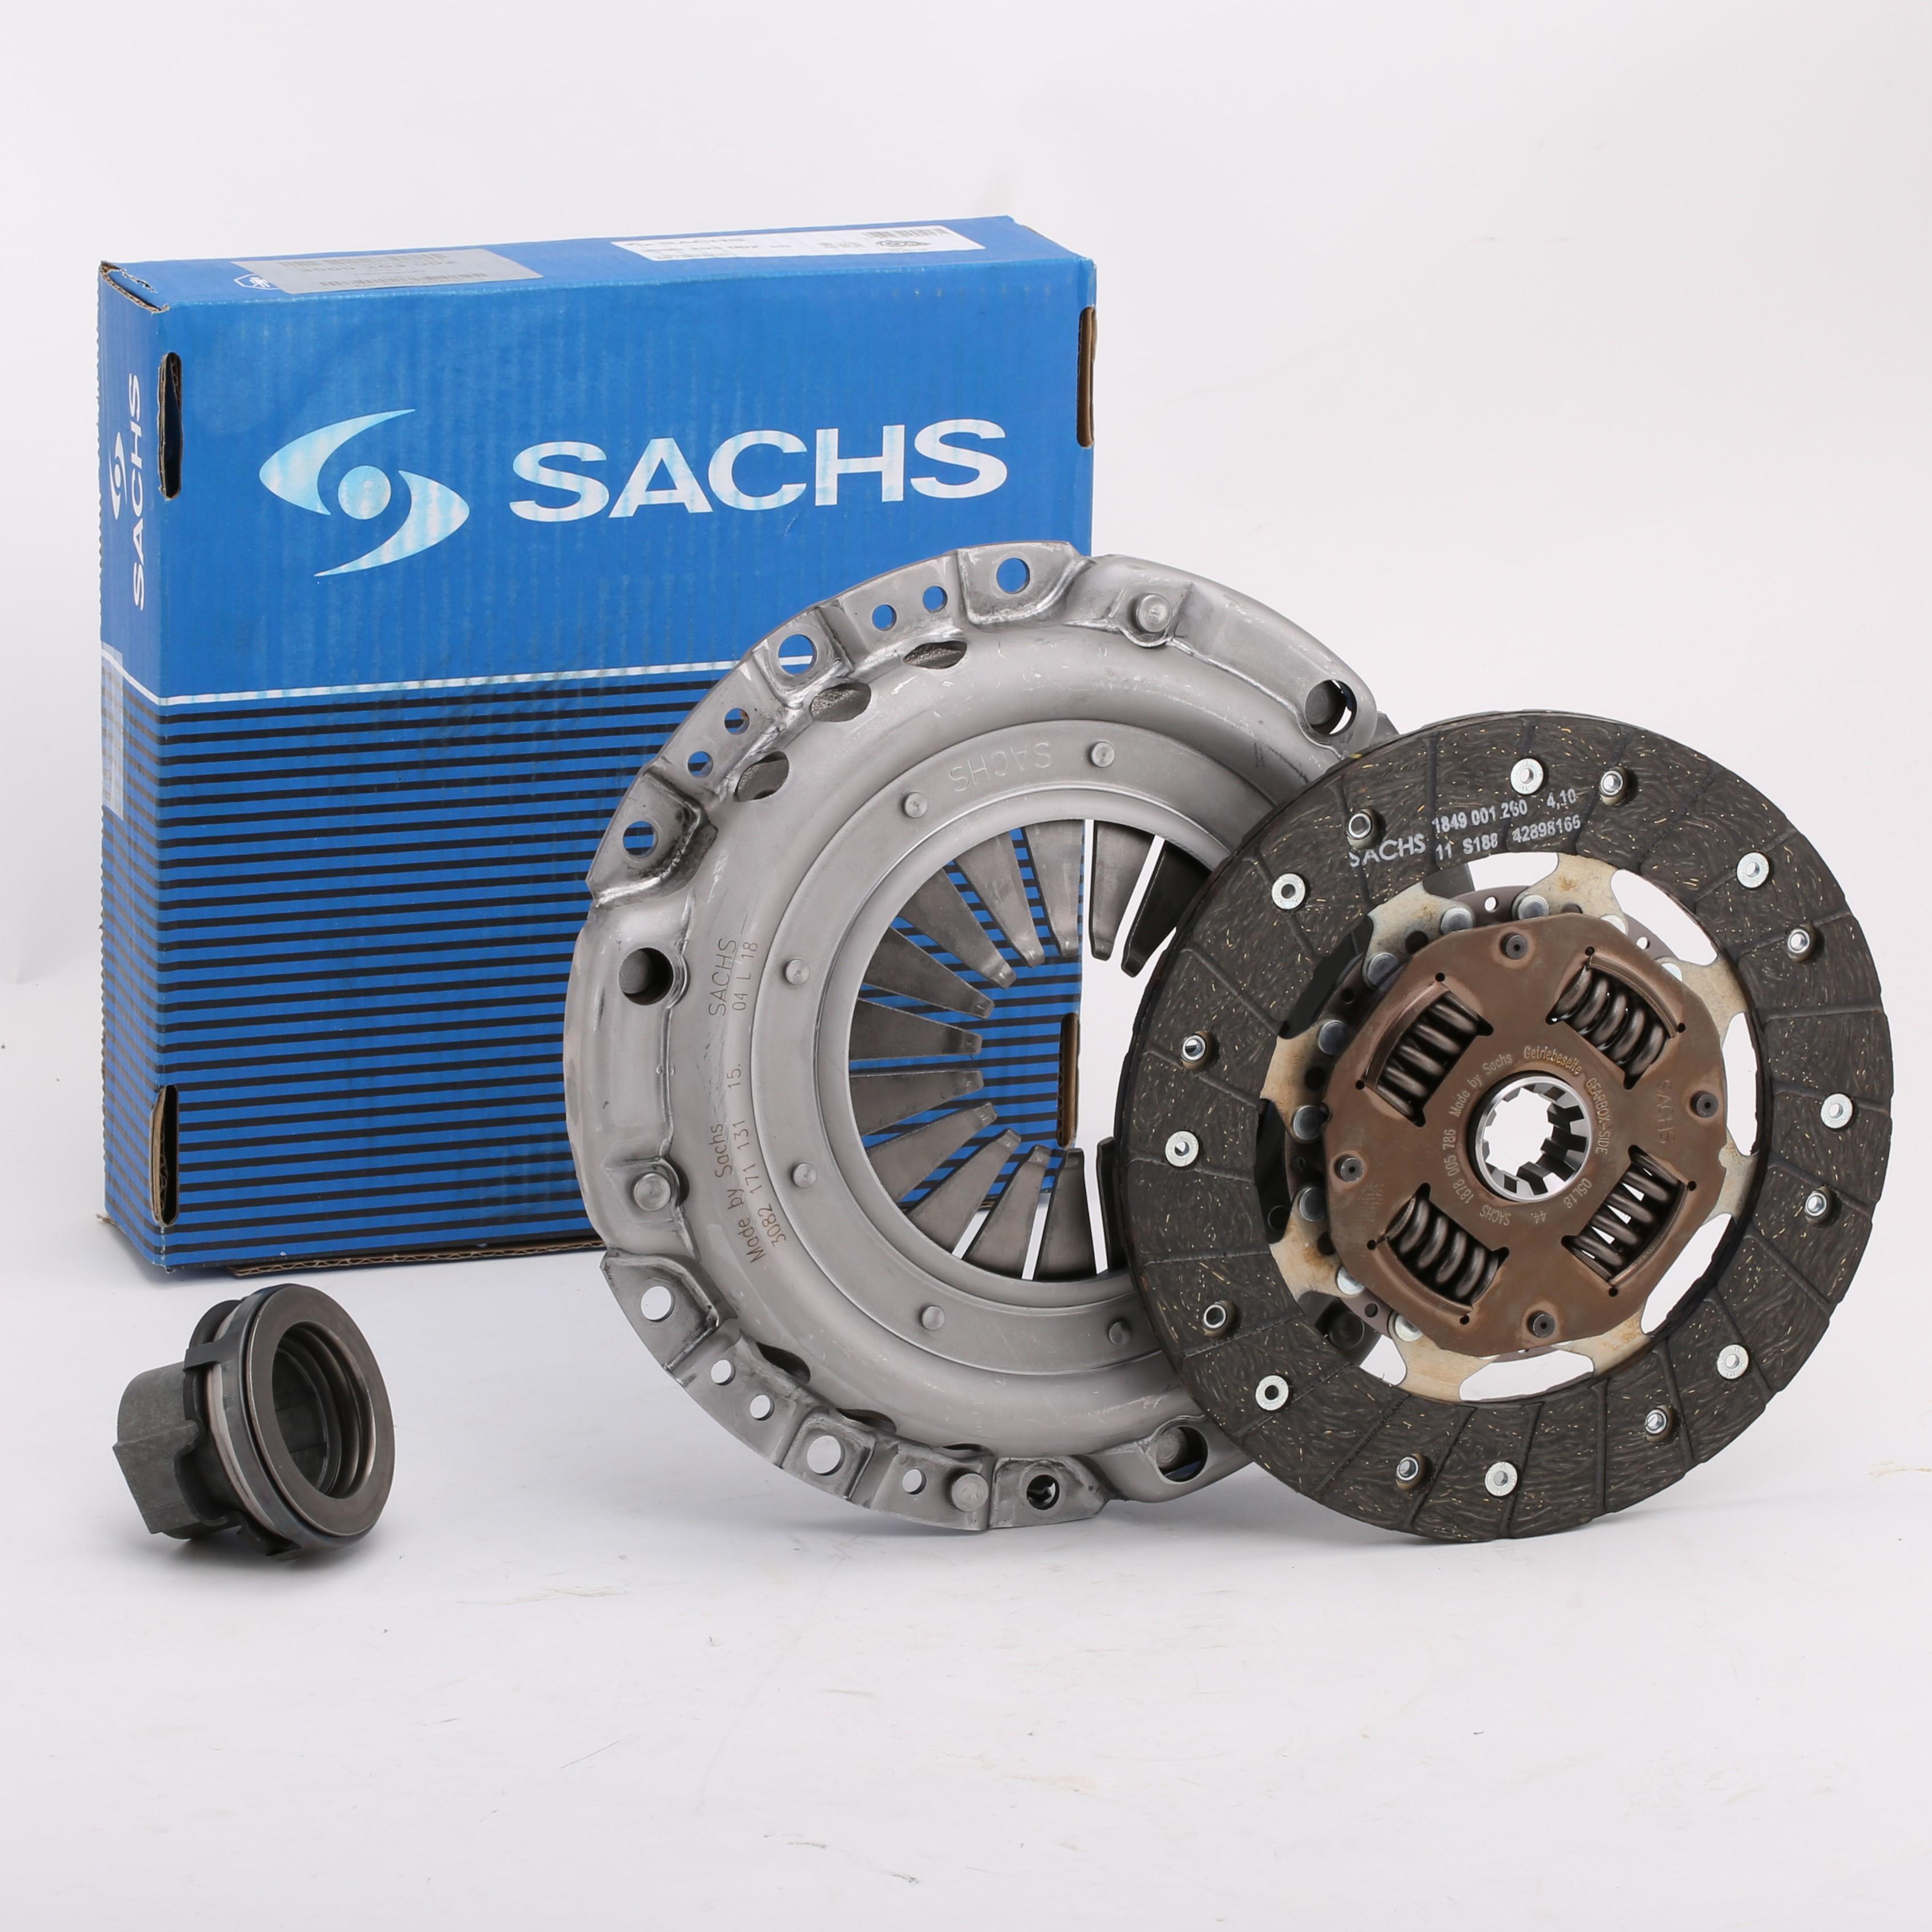 BMW 3 Series 2020 Clutch kit SACHS 3000 203 002: